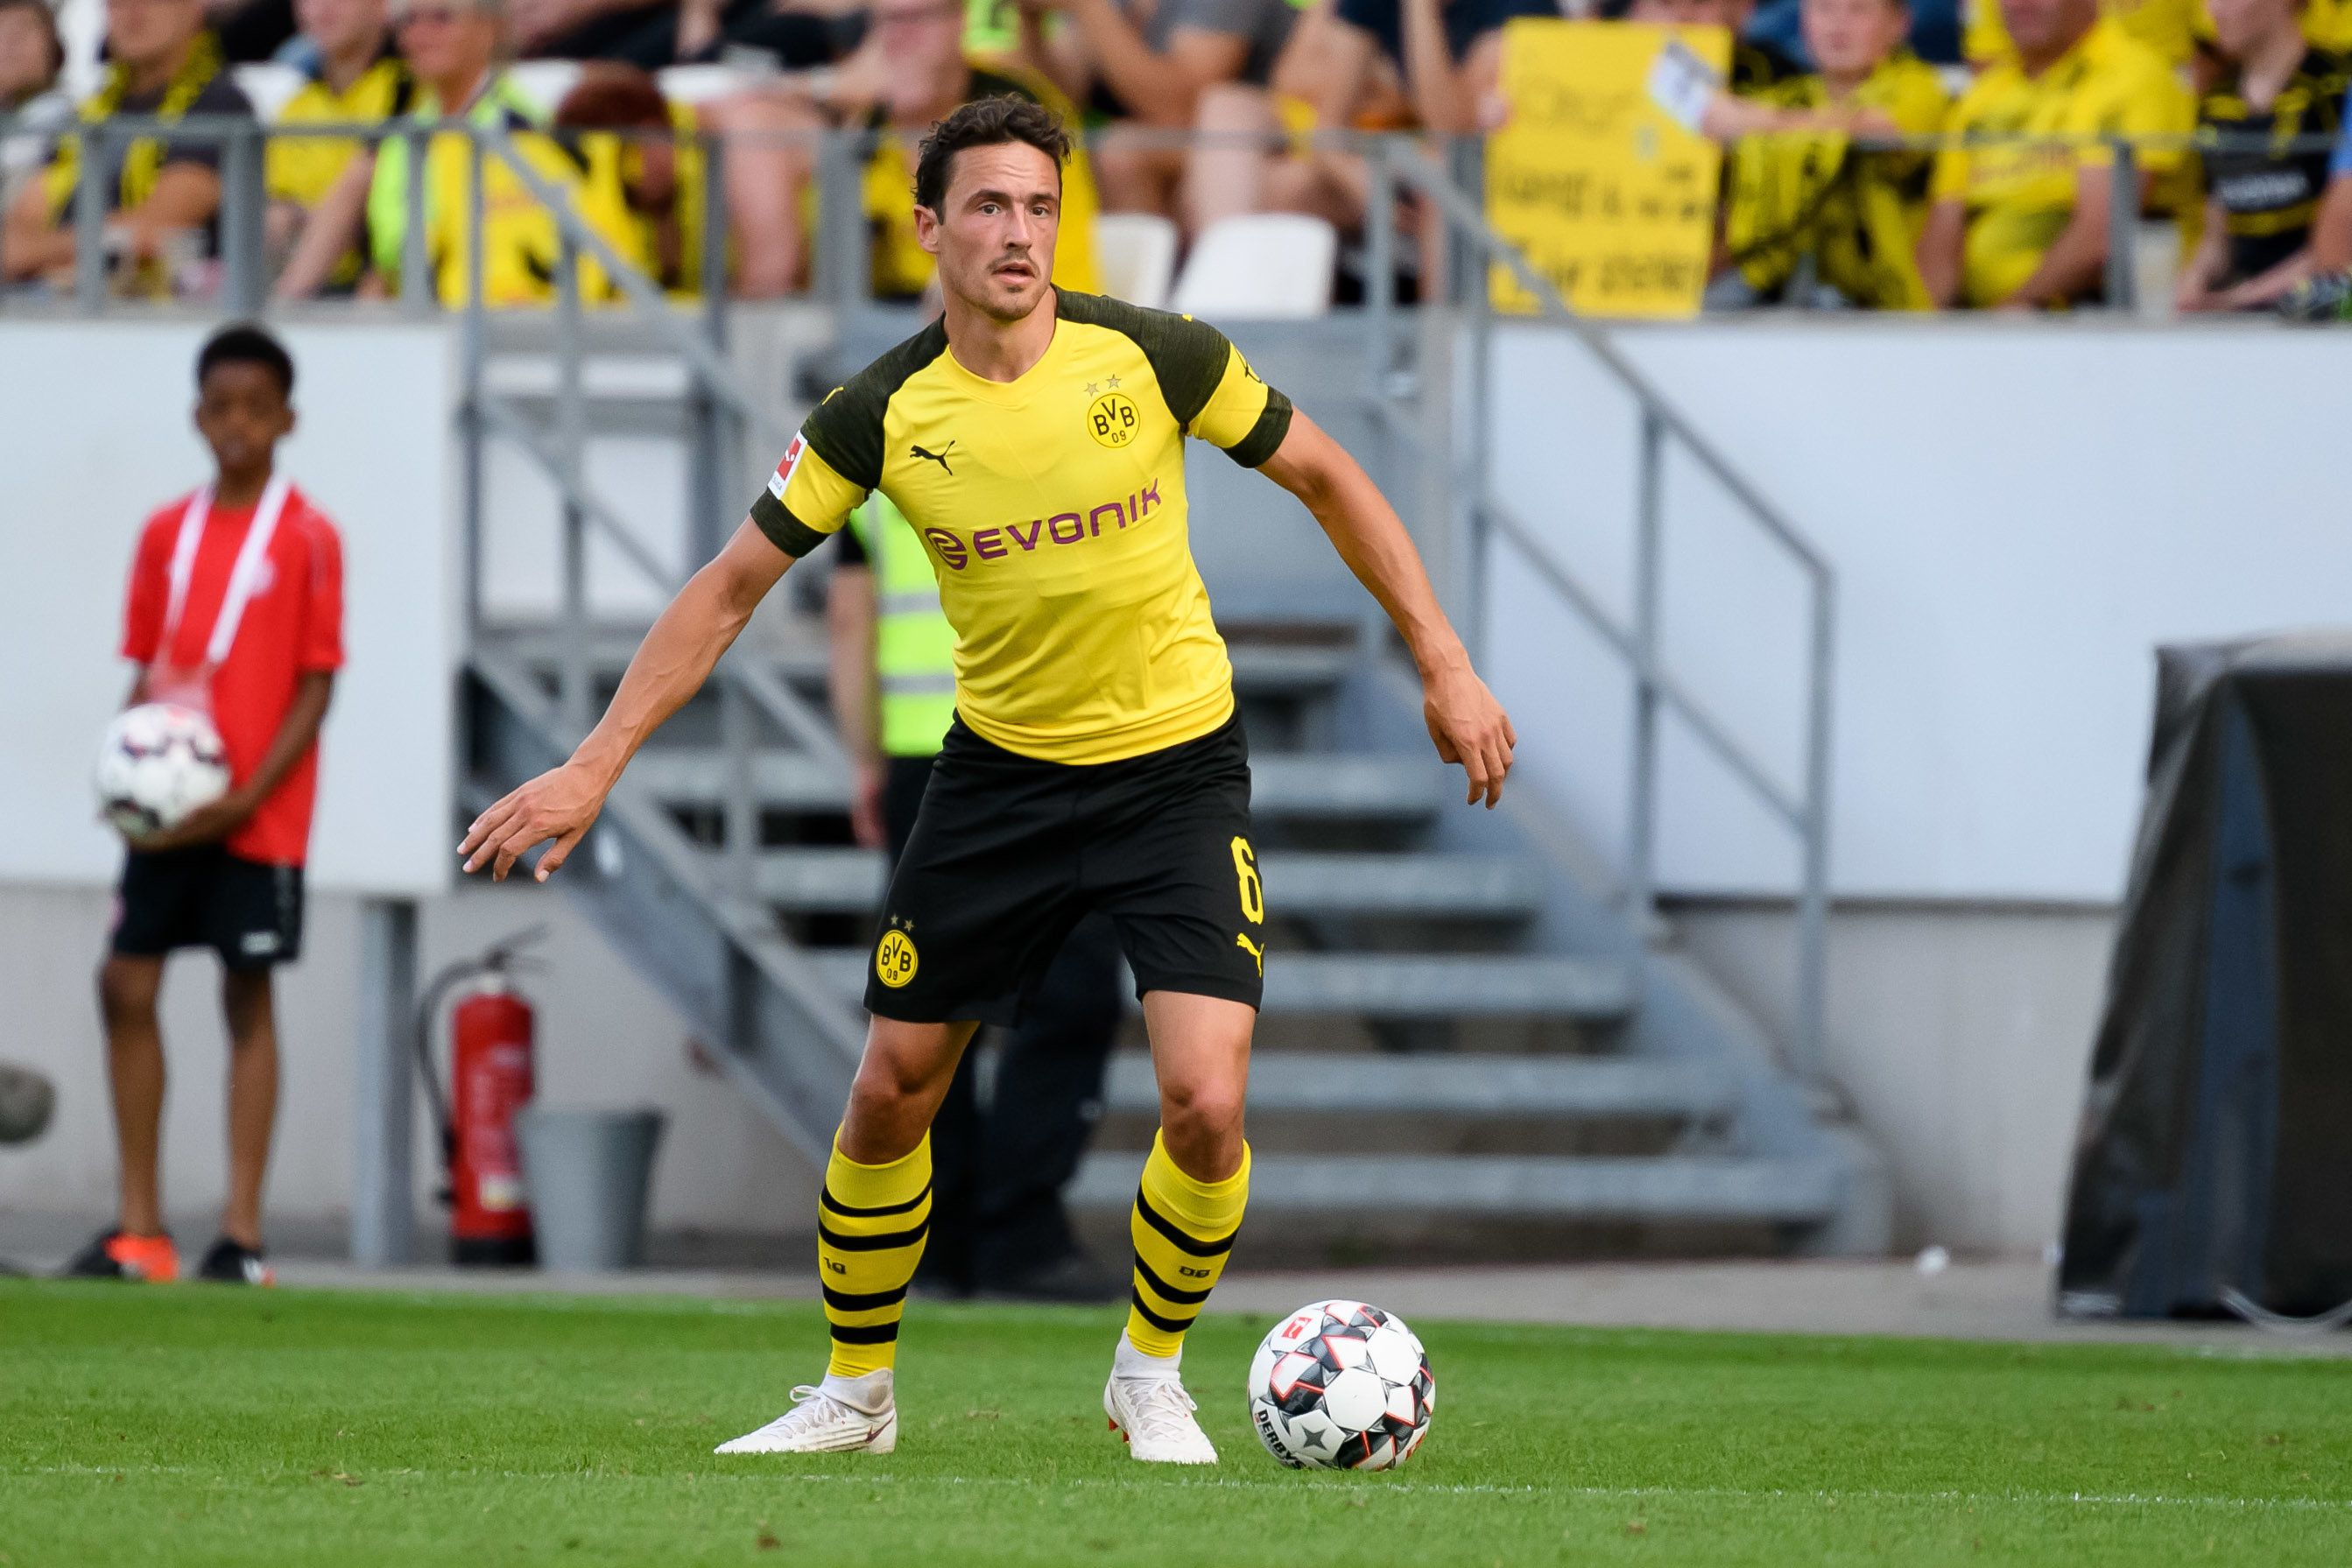 DFB-Pokal im Live-Stream: Greuther Fürth – Borussia Dortmund online